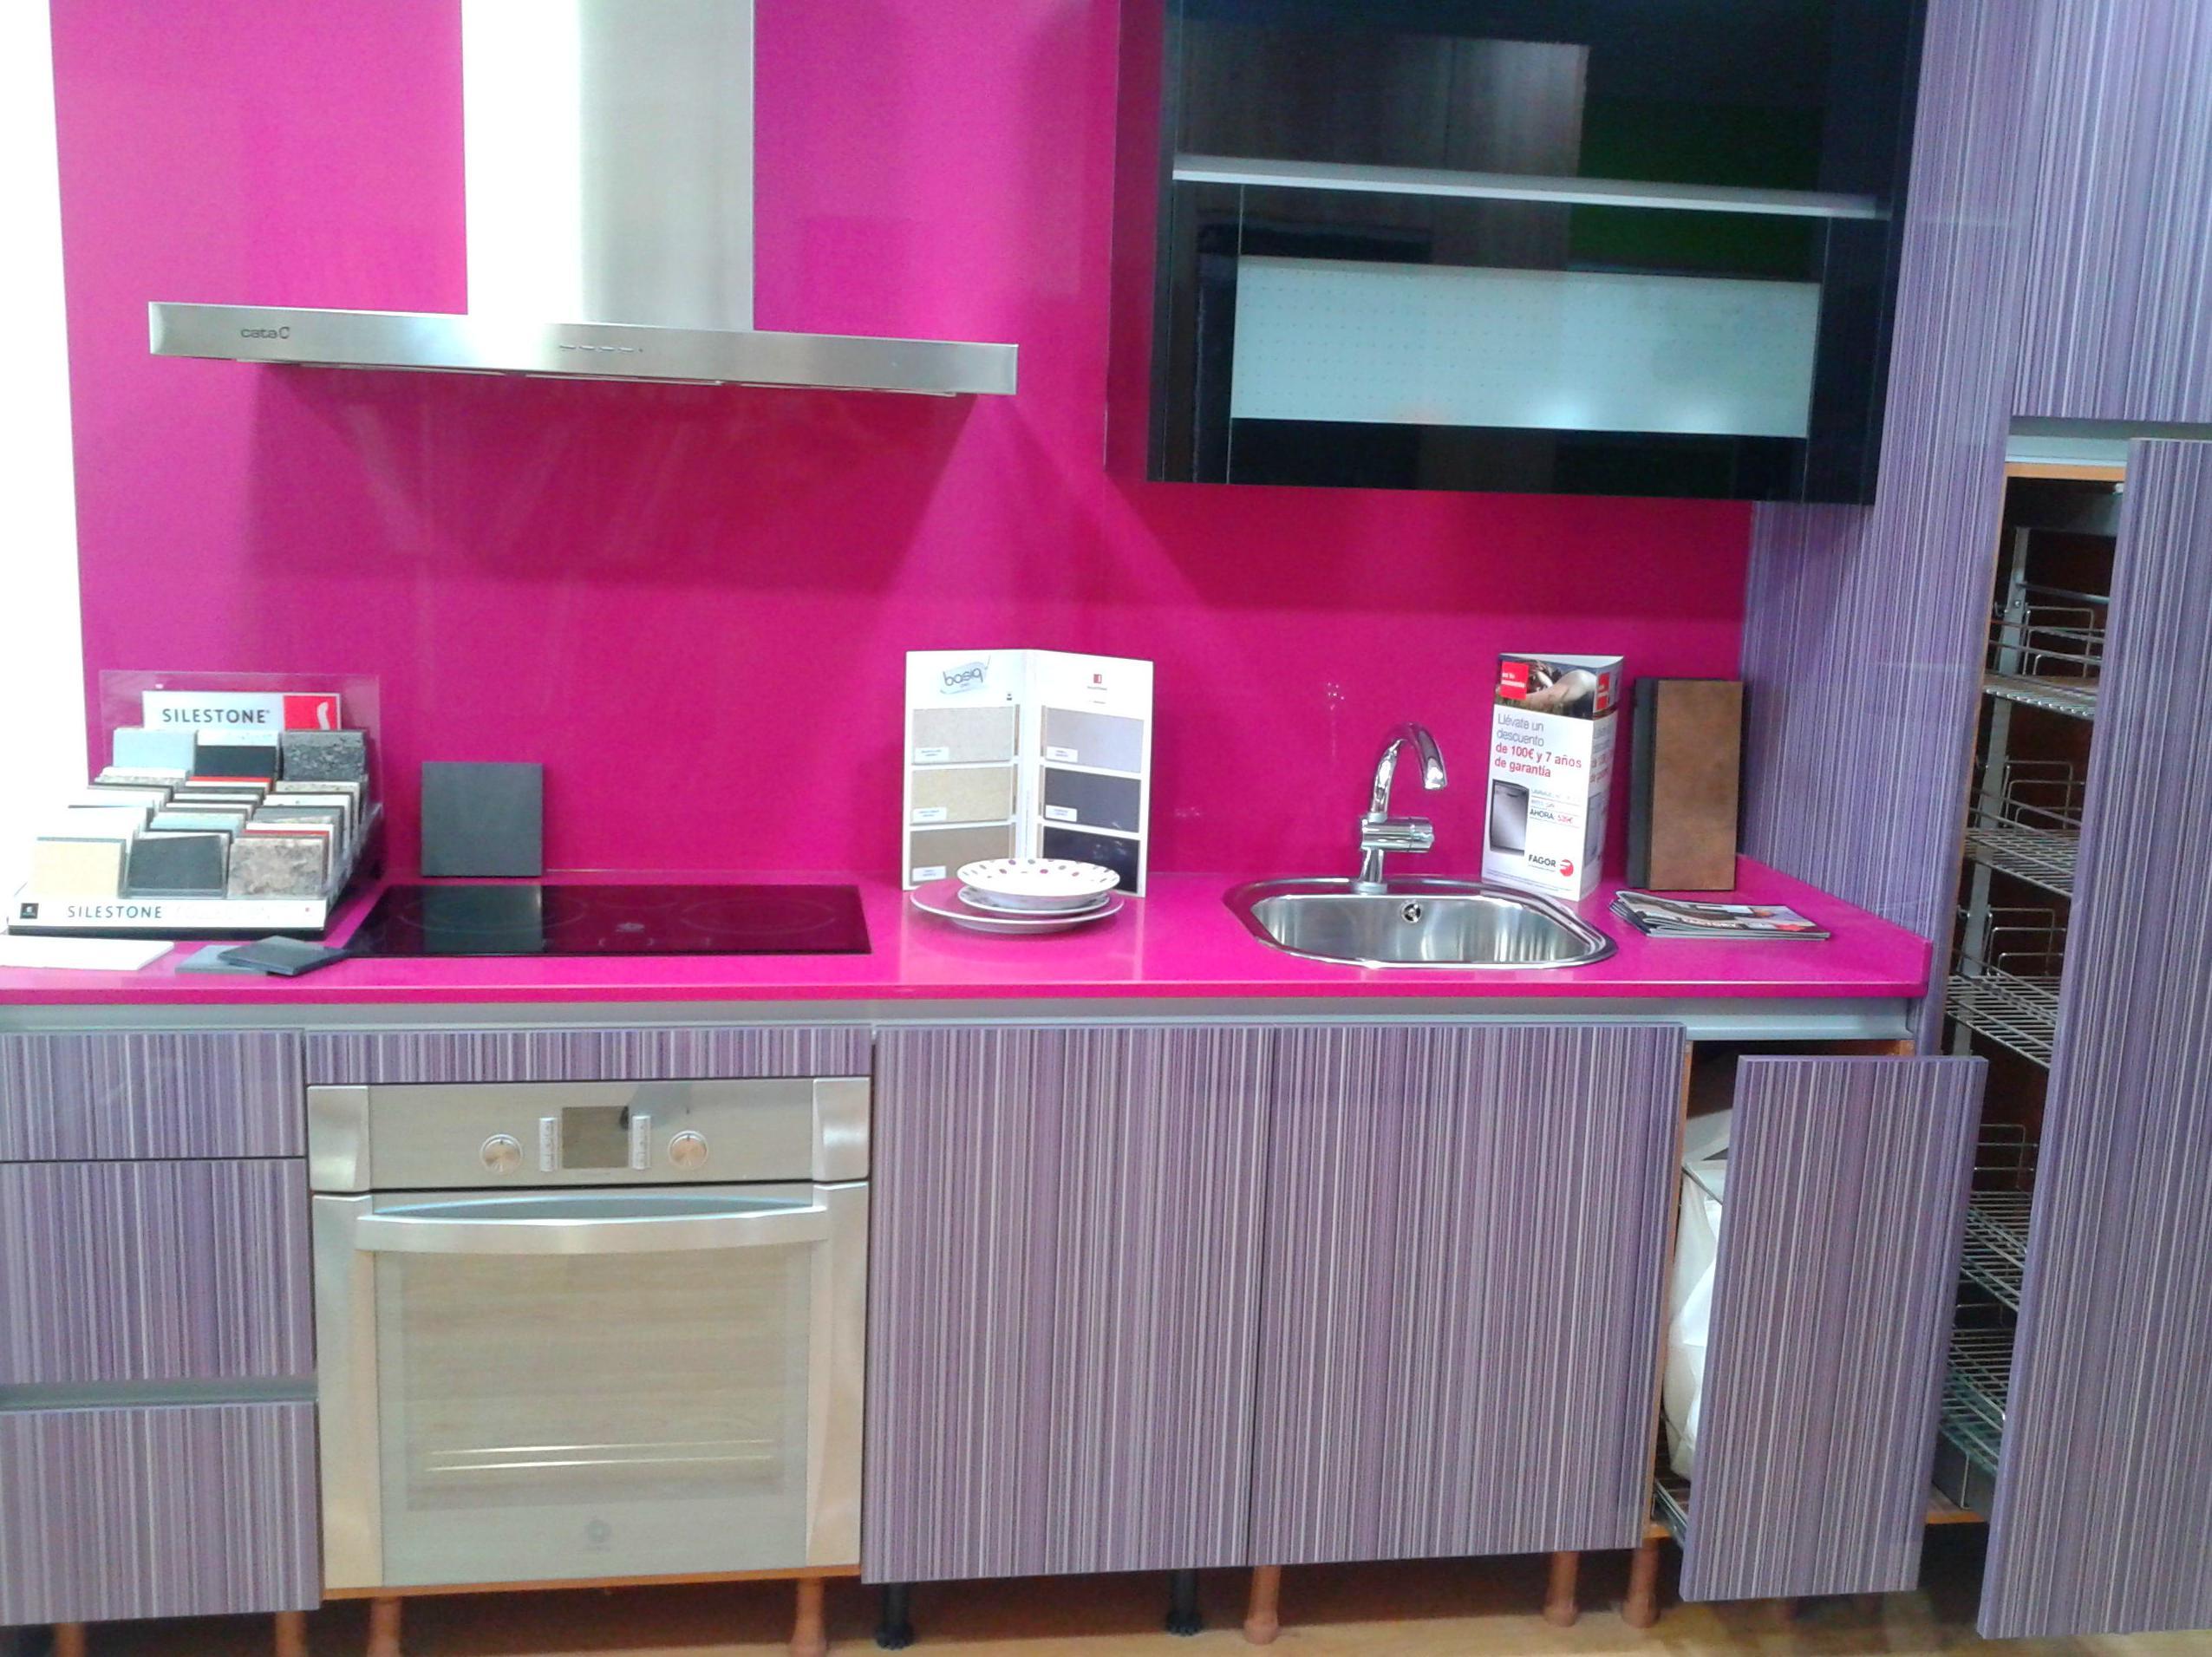 Venta cocina exposici n muebles silestone servicios de cuin factory - Exposicion cocinas barcelona ...